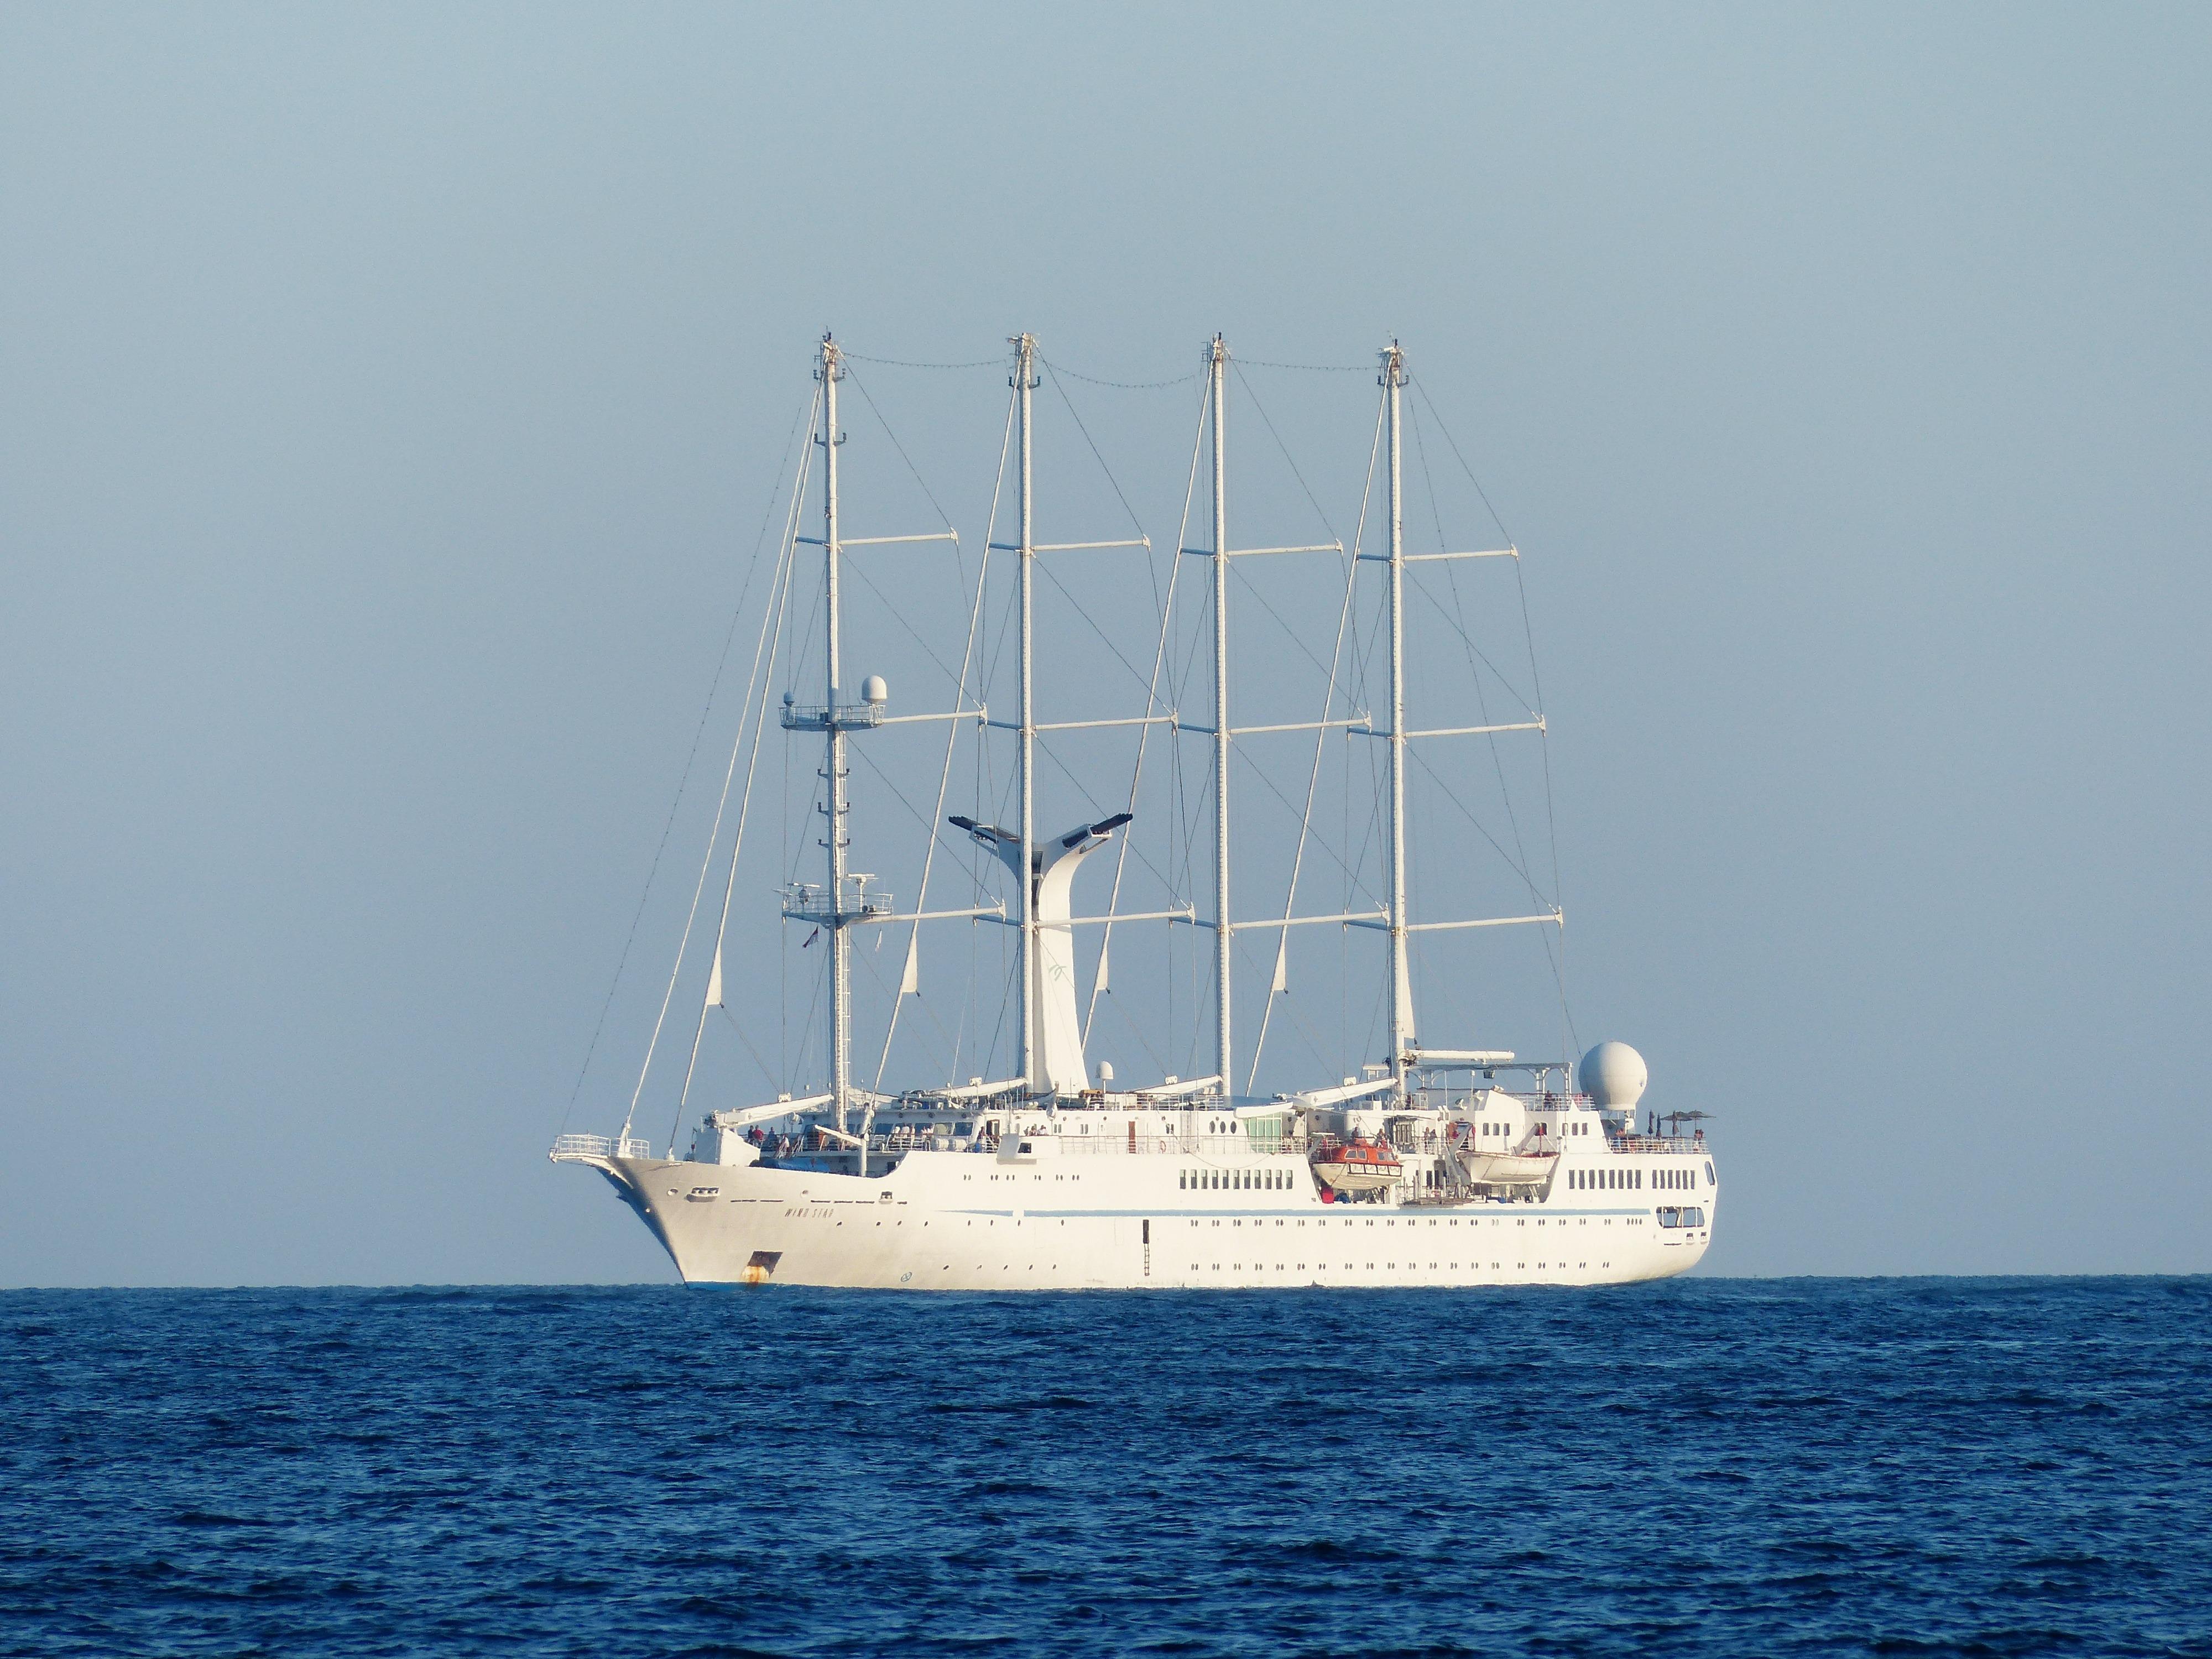 Free Images Sea Water Ocean Boat Vehicle Mast Sailboat